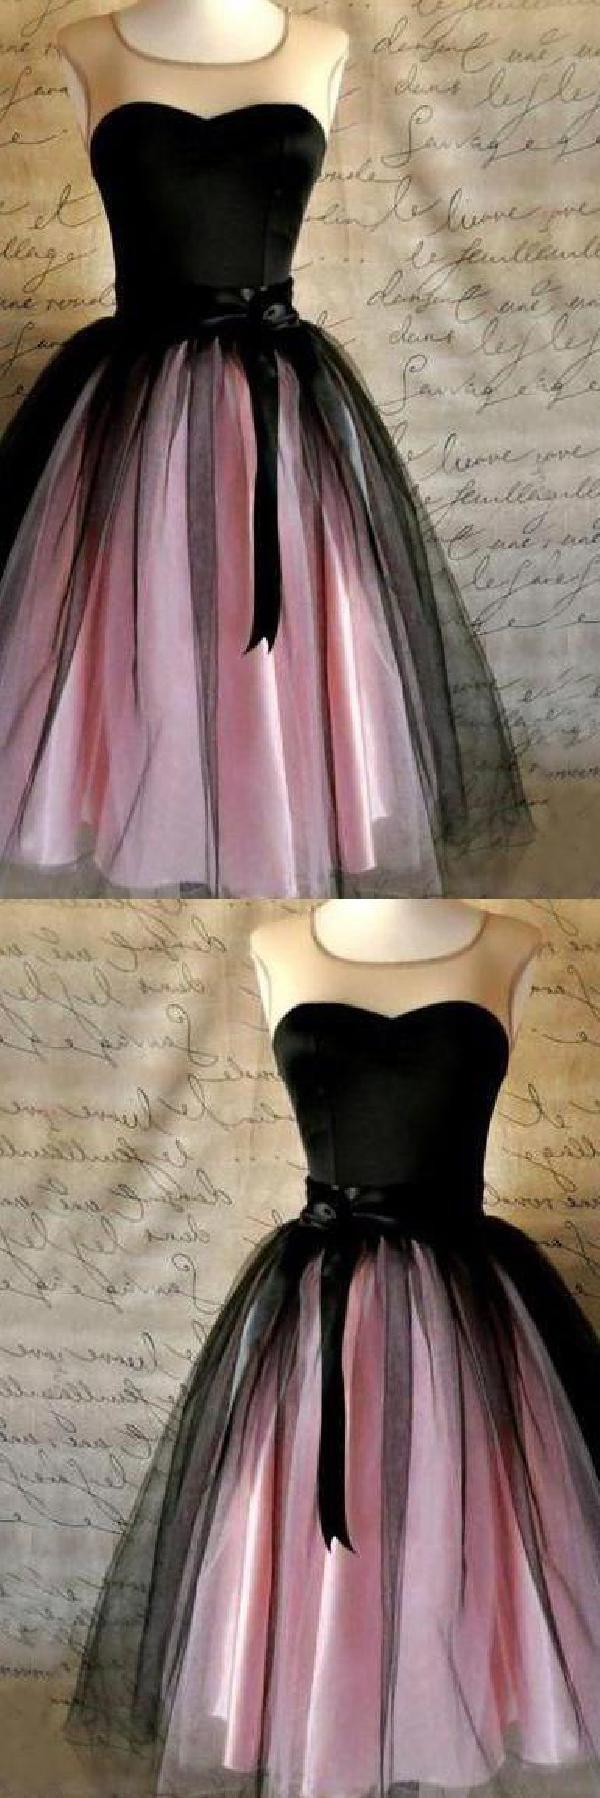 Prom dresses pink vintage prom dresses black prom dresses short